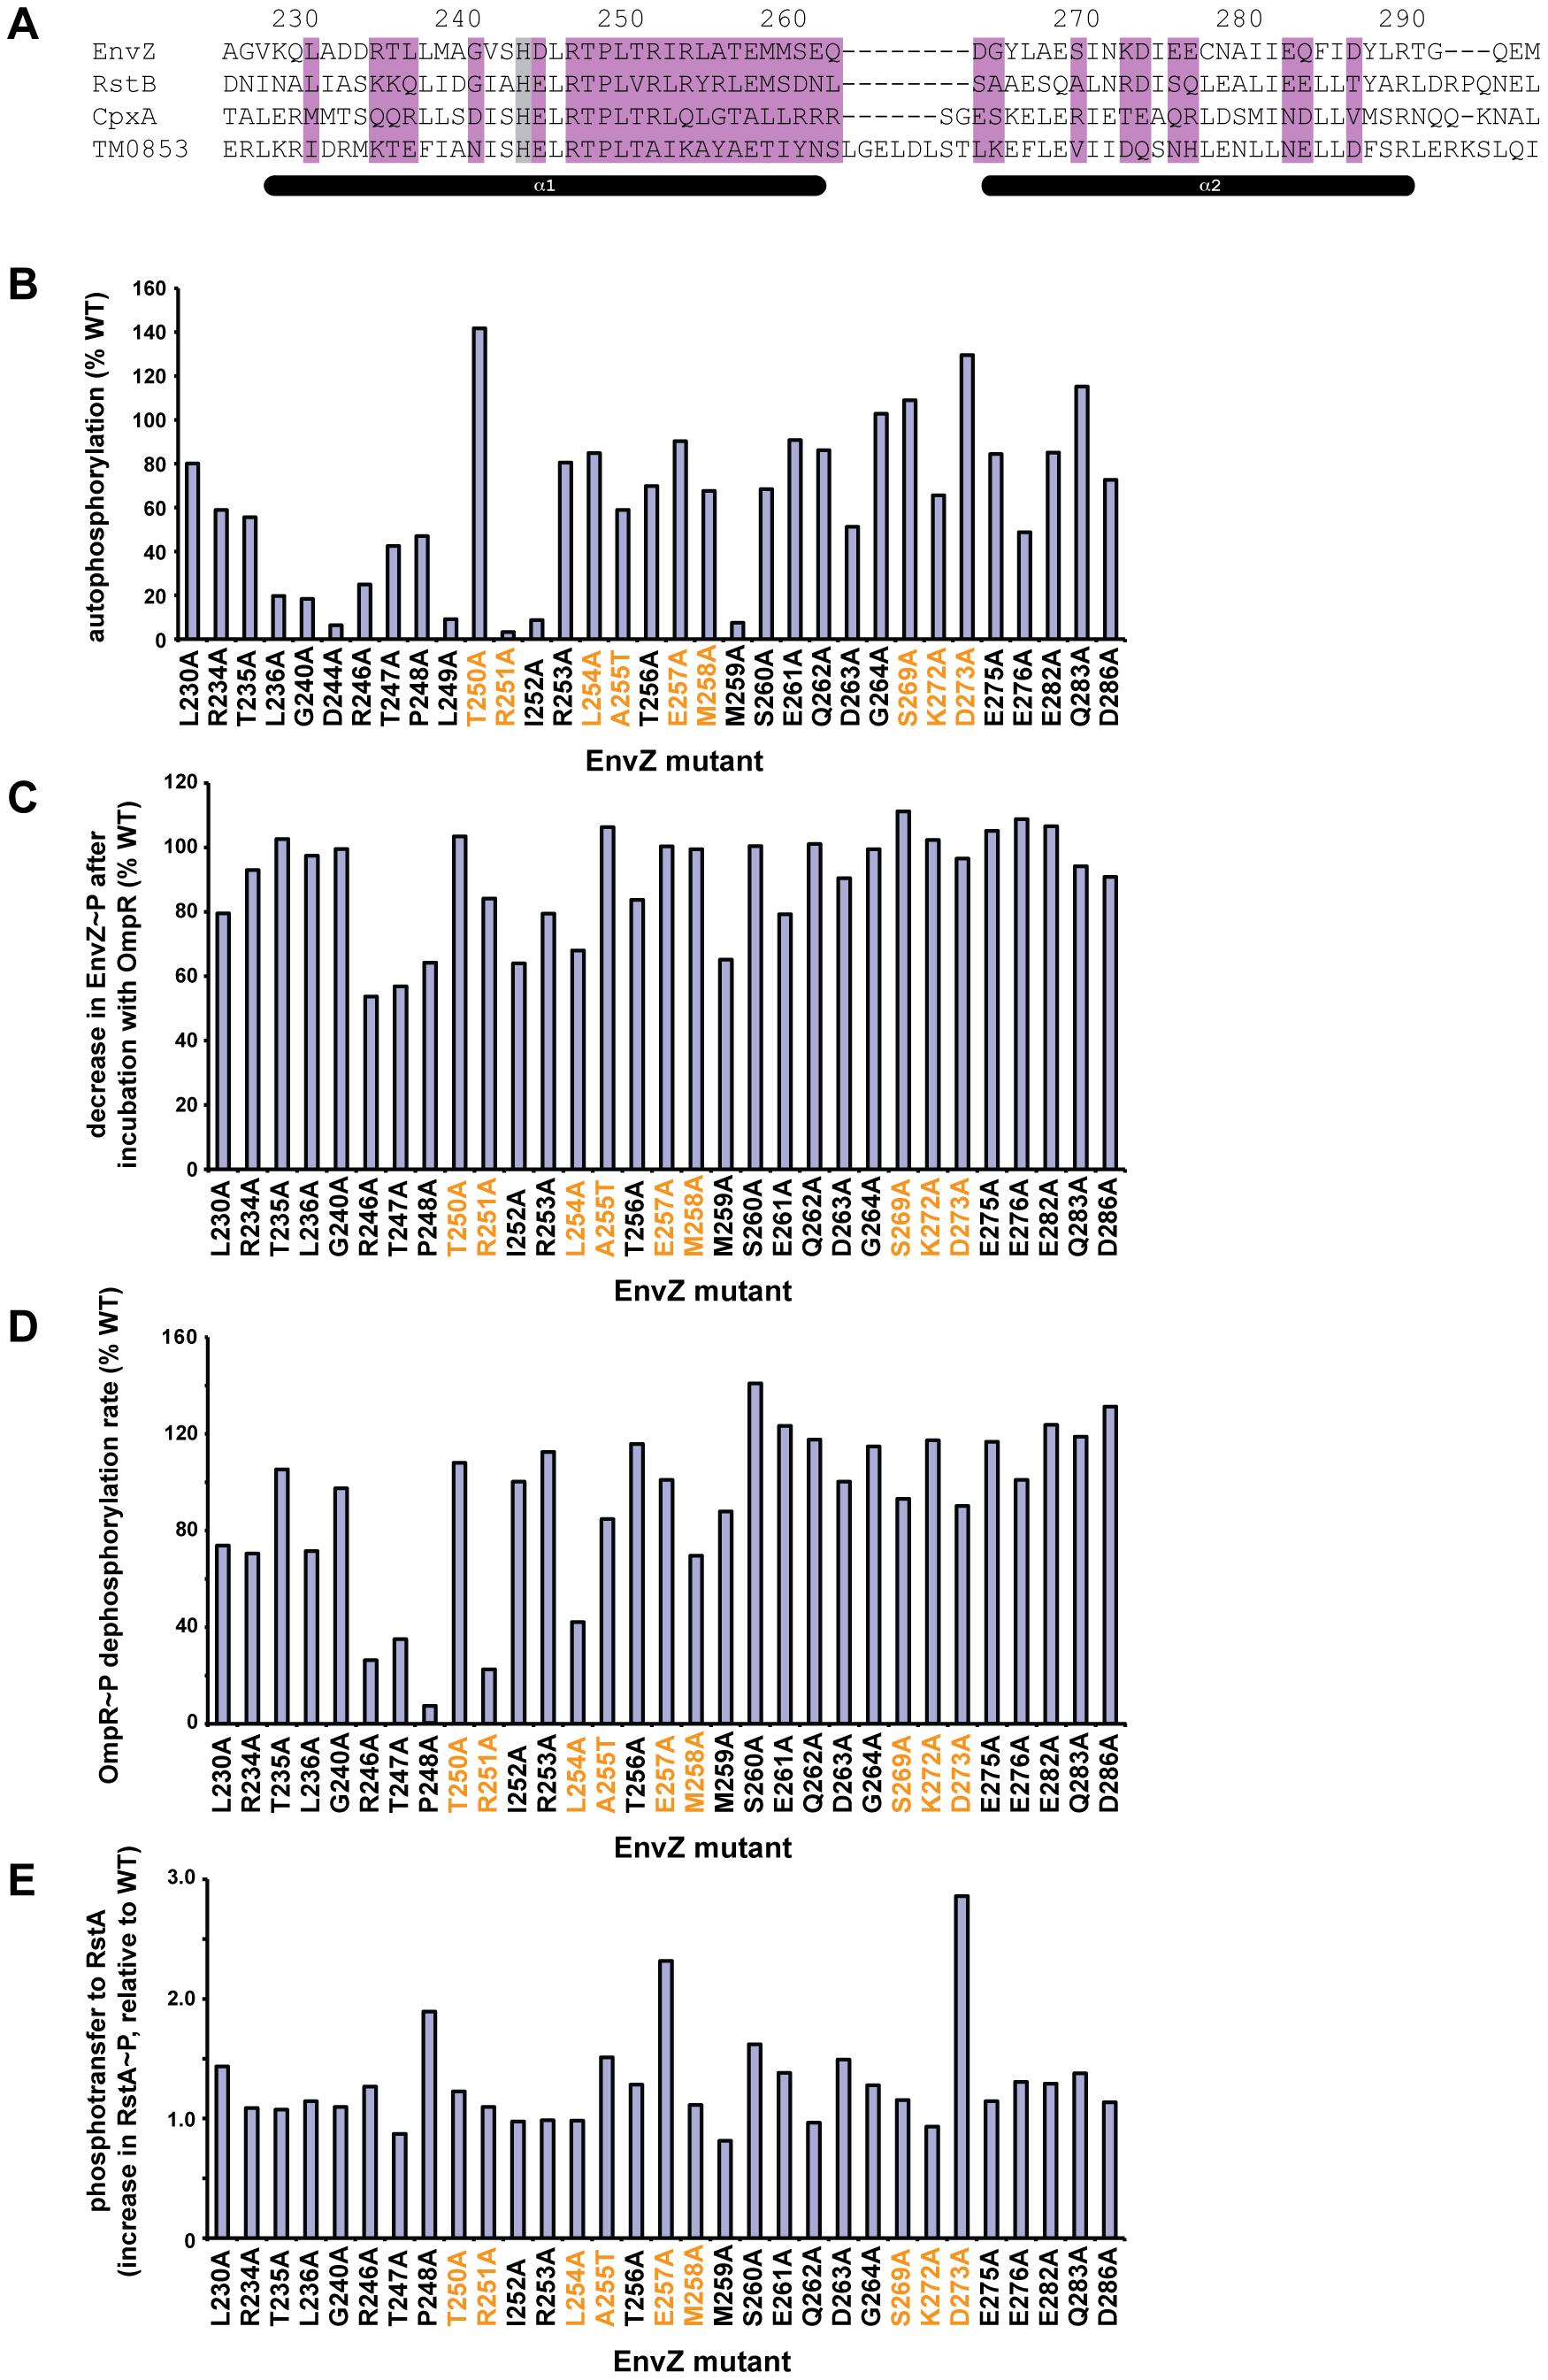 Alanine-scanning mutagenesis of EnvZ.